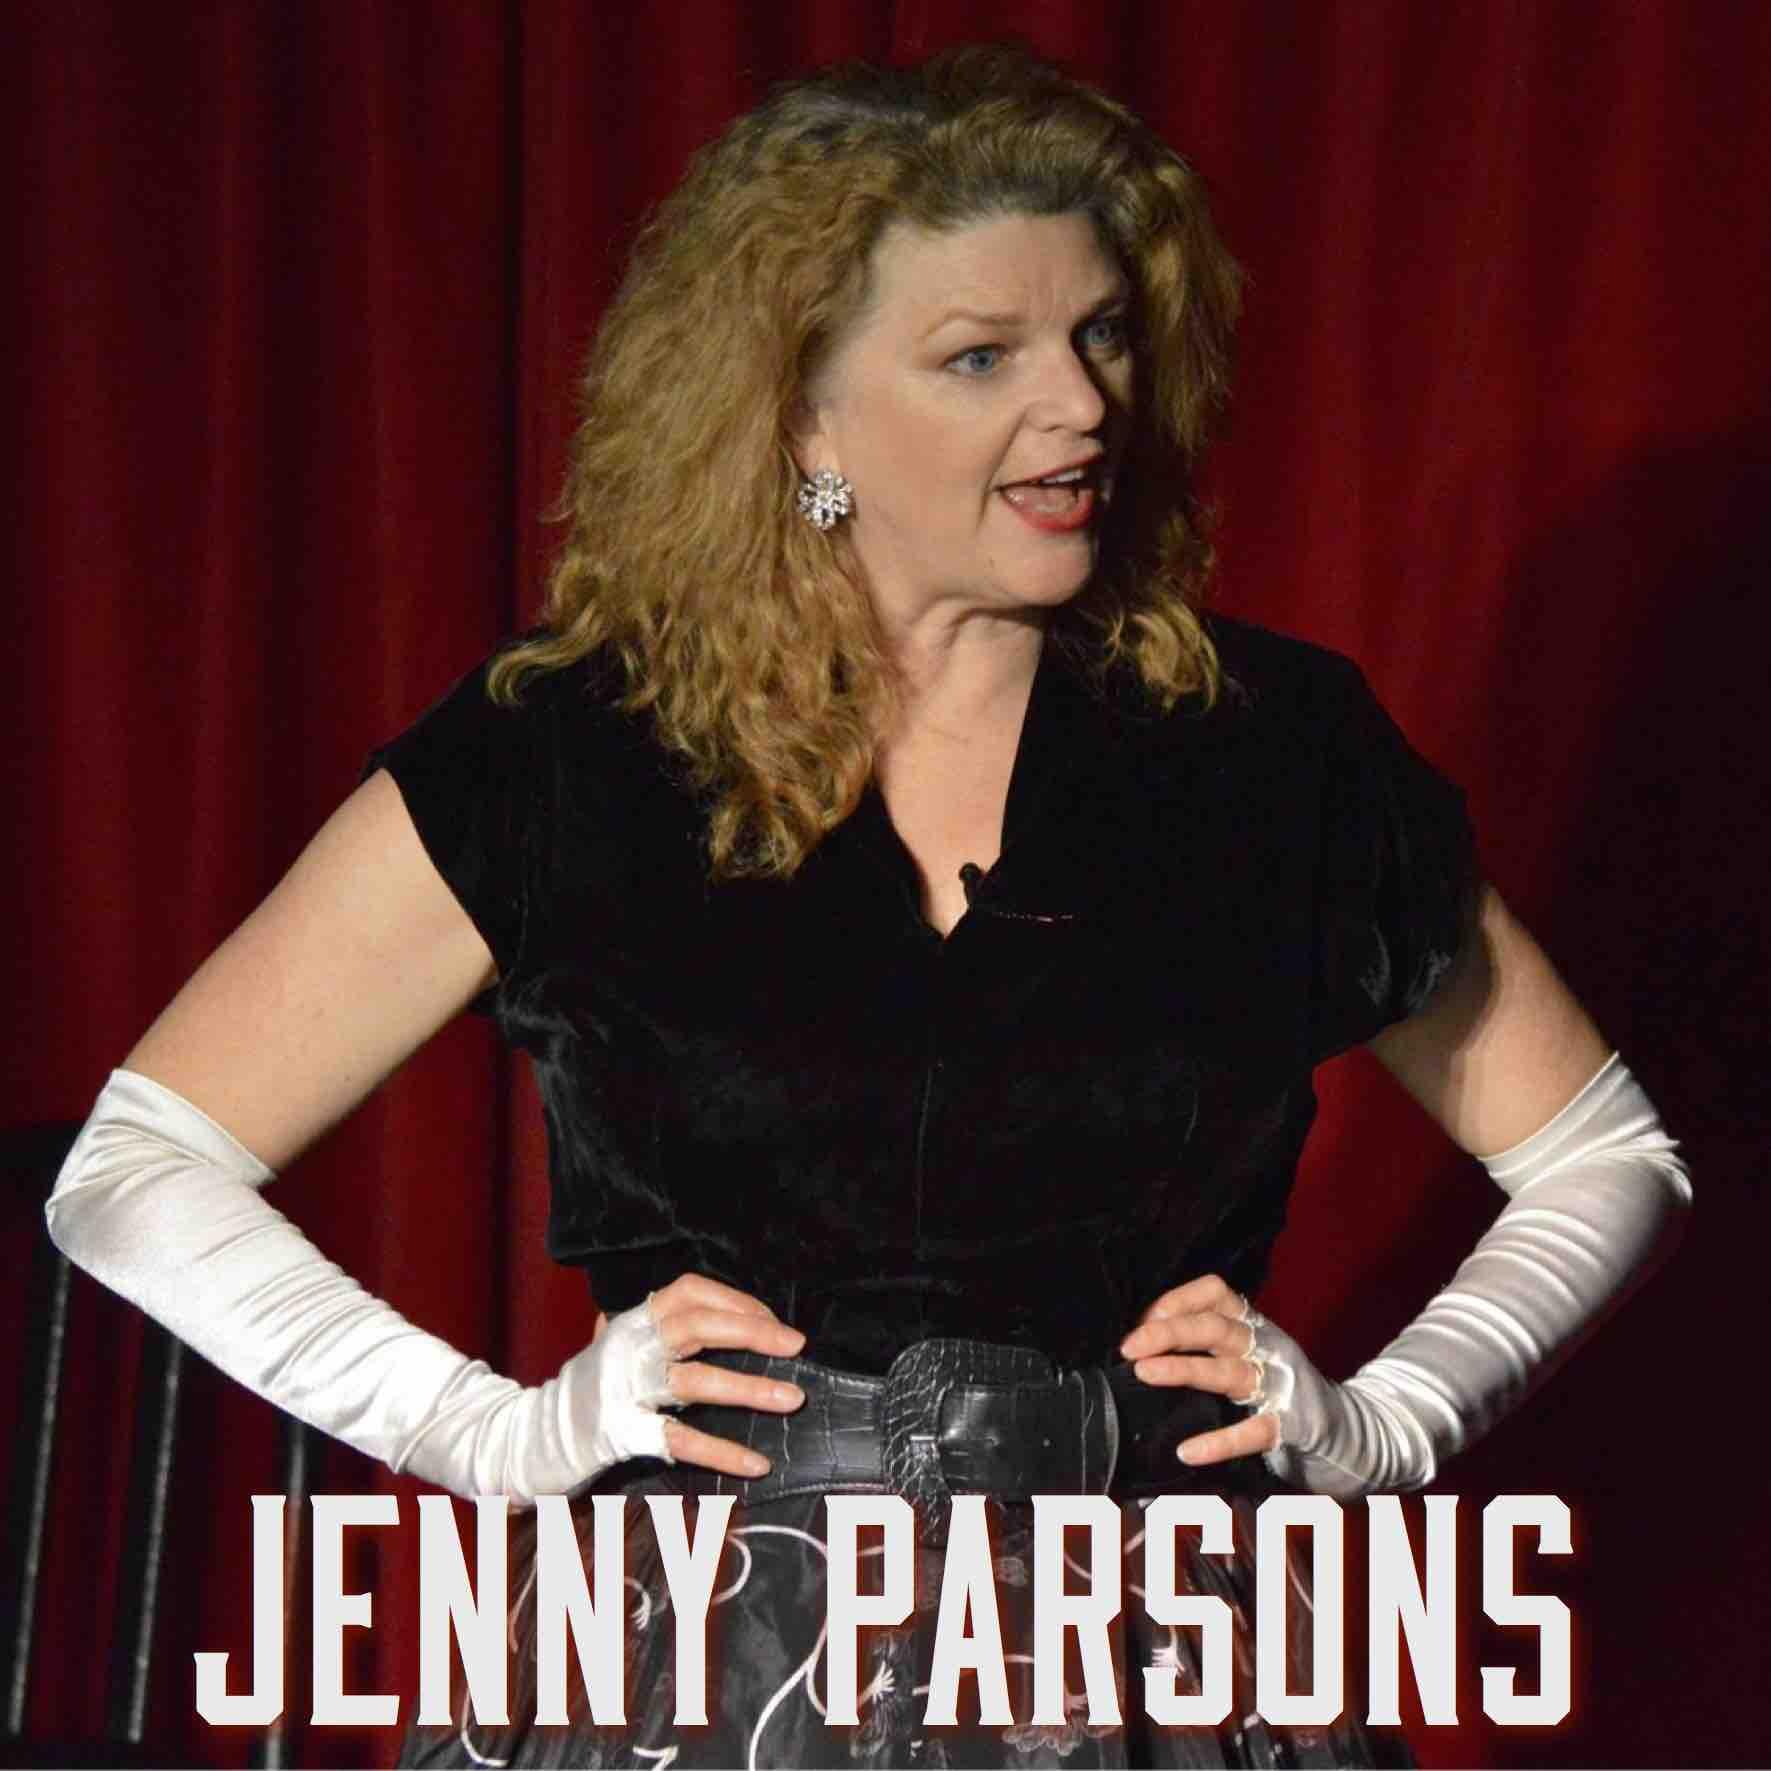 Parsons-Jenny.jpg